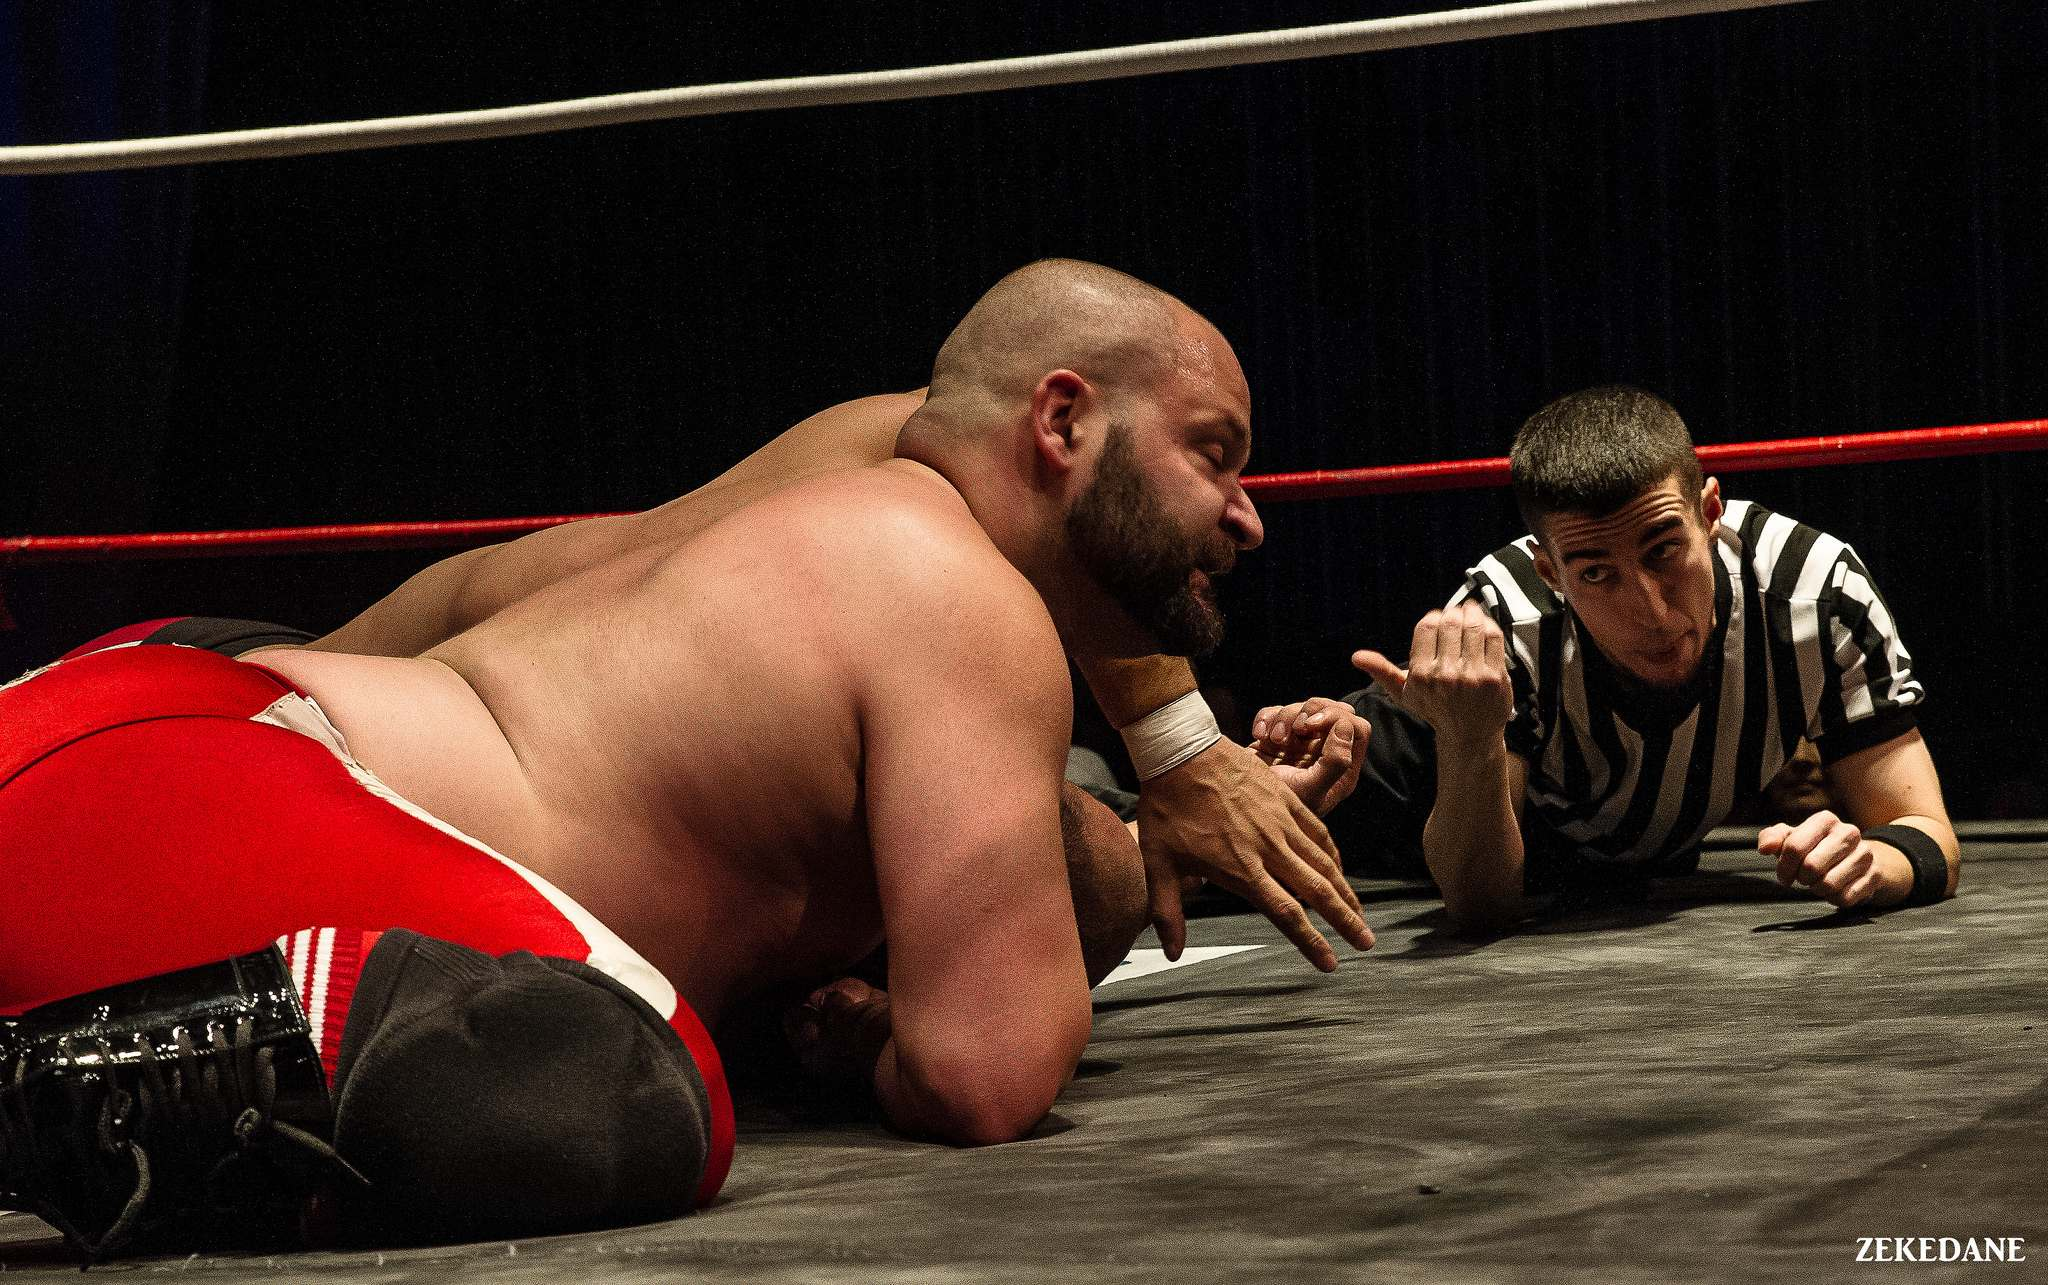 pro wrestling7 Pro Wrestling in New England 2016